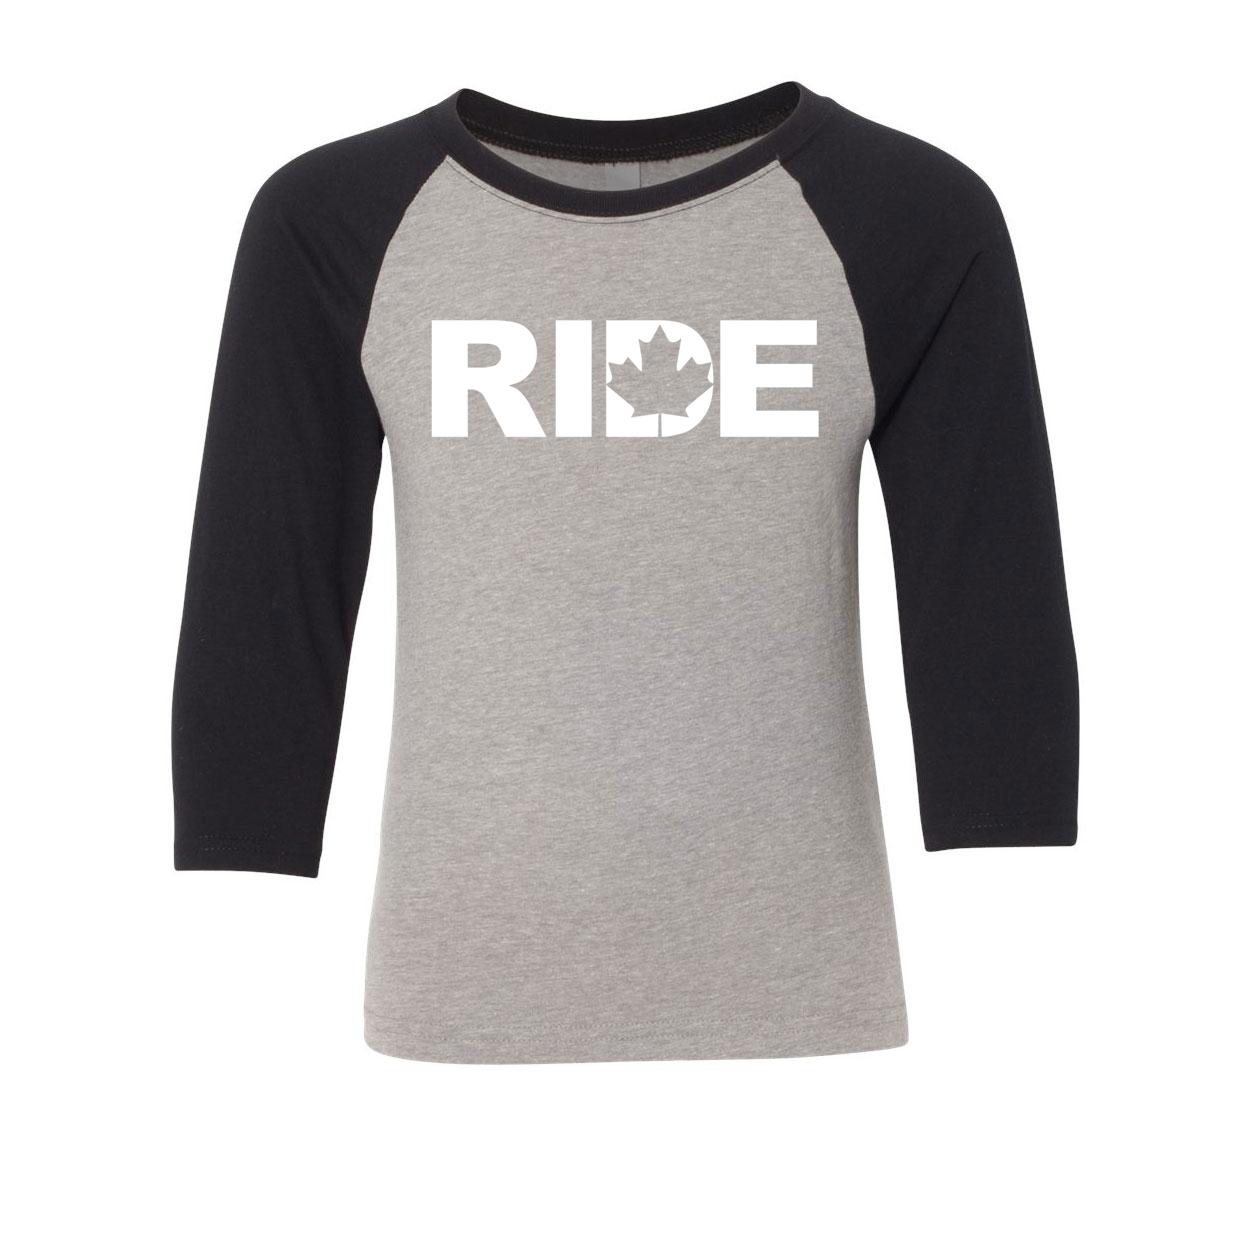 Ride Canada Classic Youth Premium Raglan Shirt Gray/Black (White Logo)